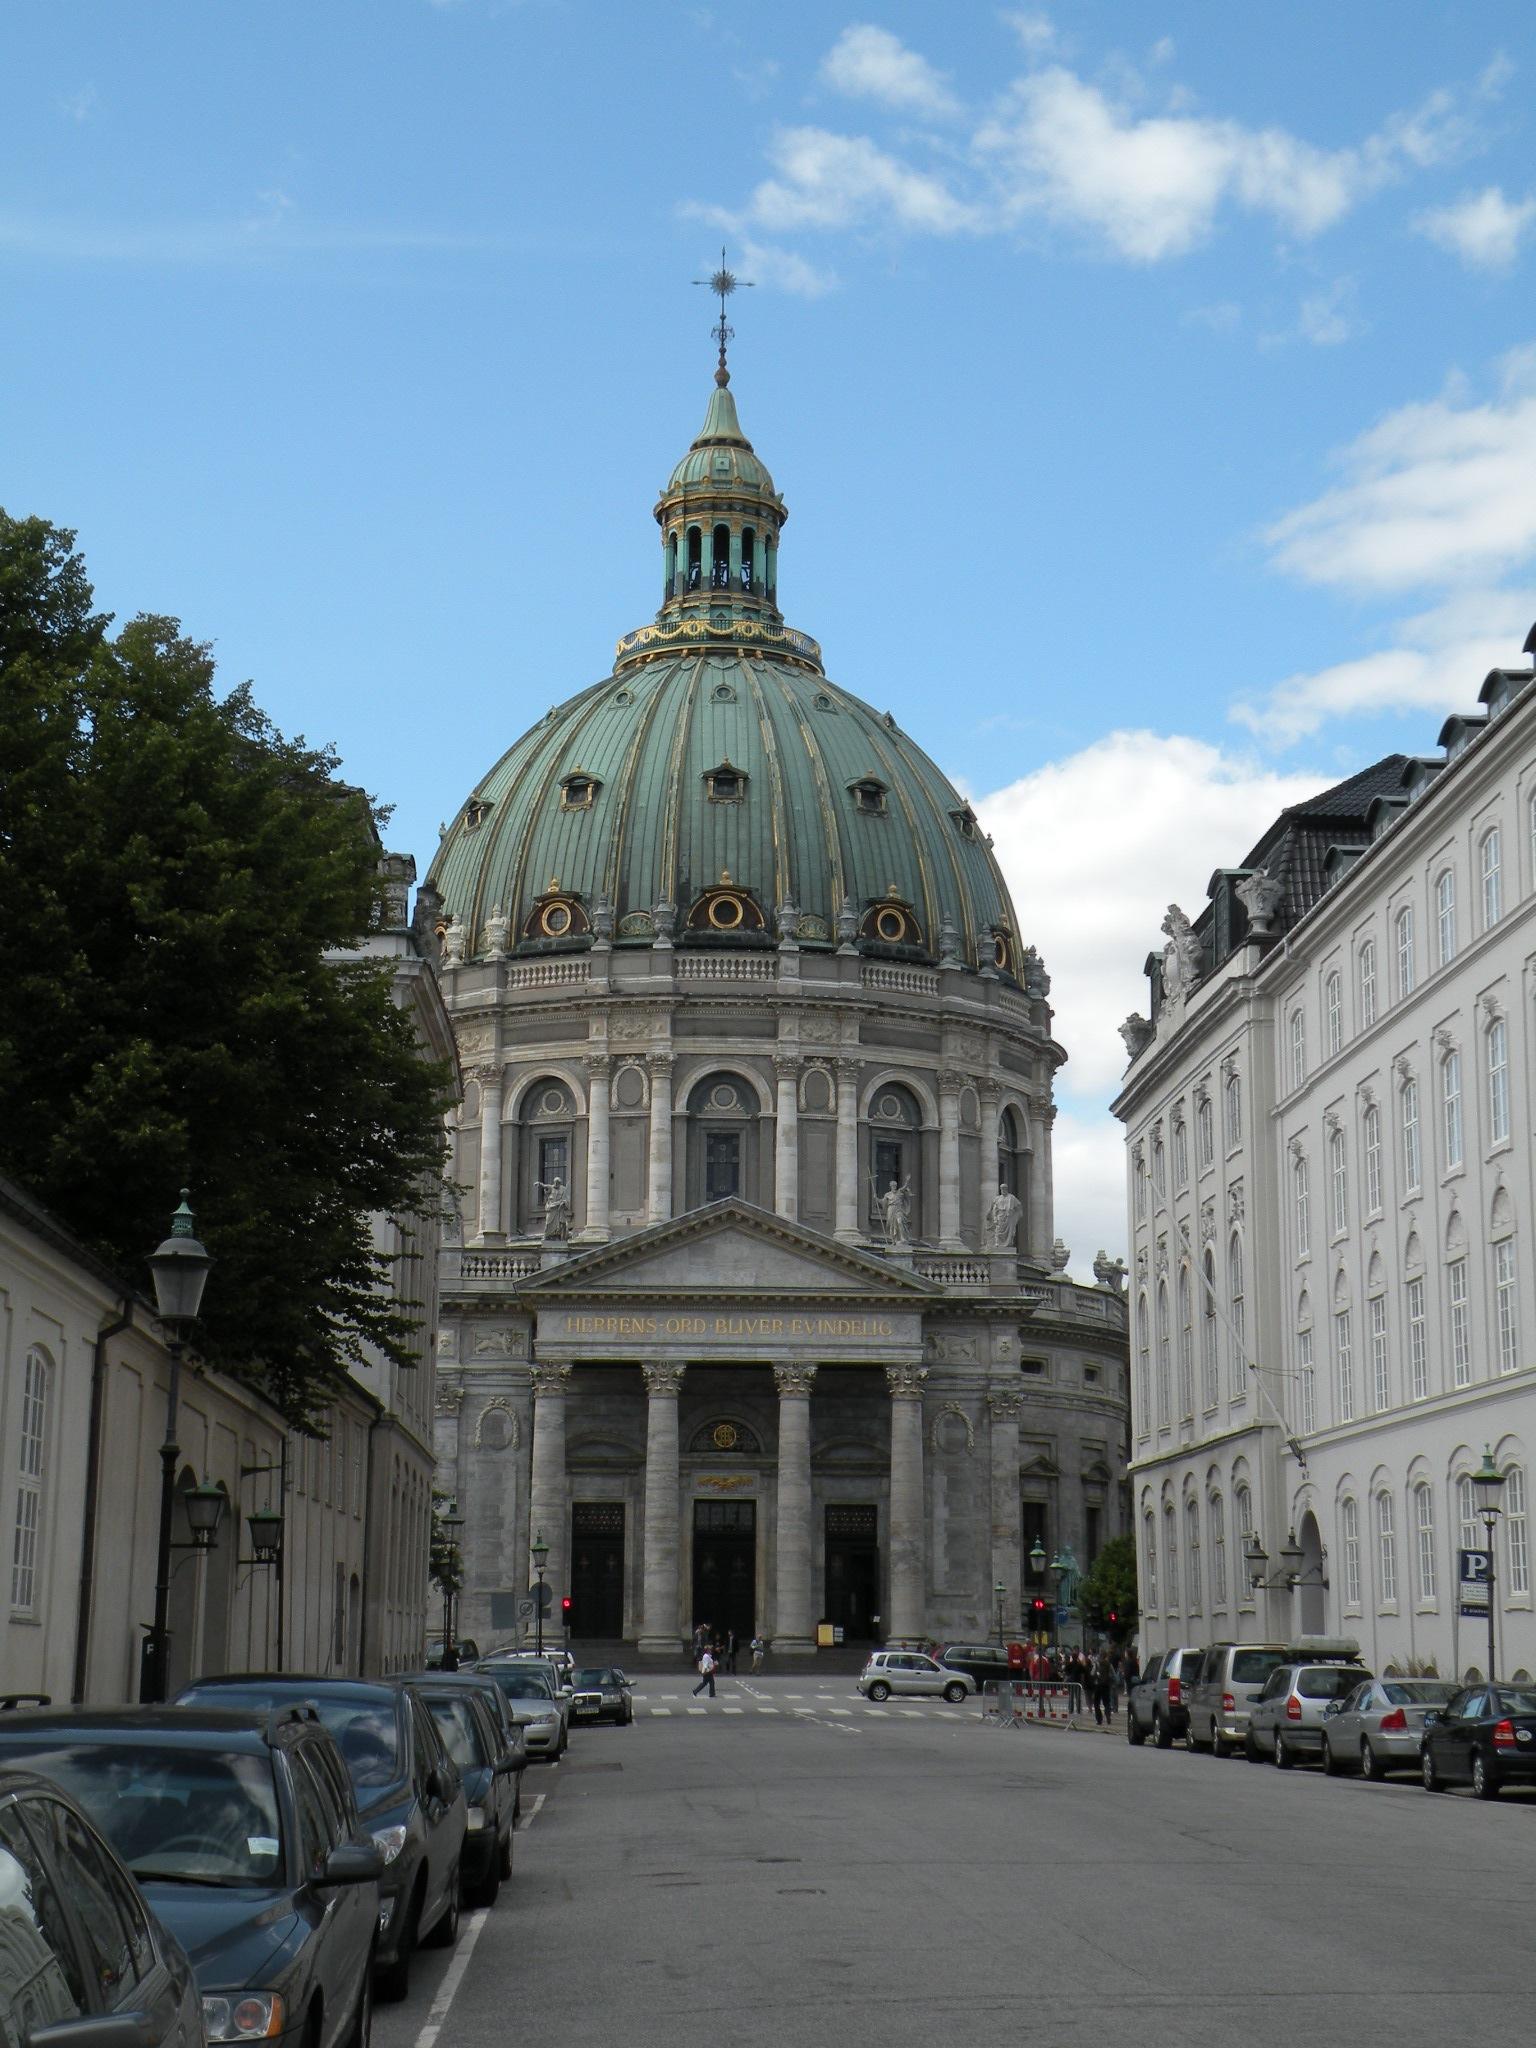 Marble Church in Copenhagen - street view.jpg